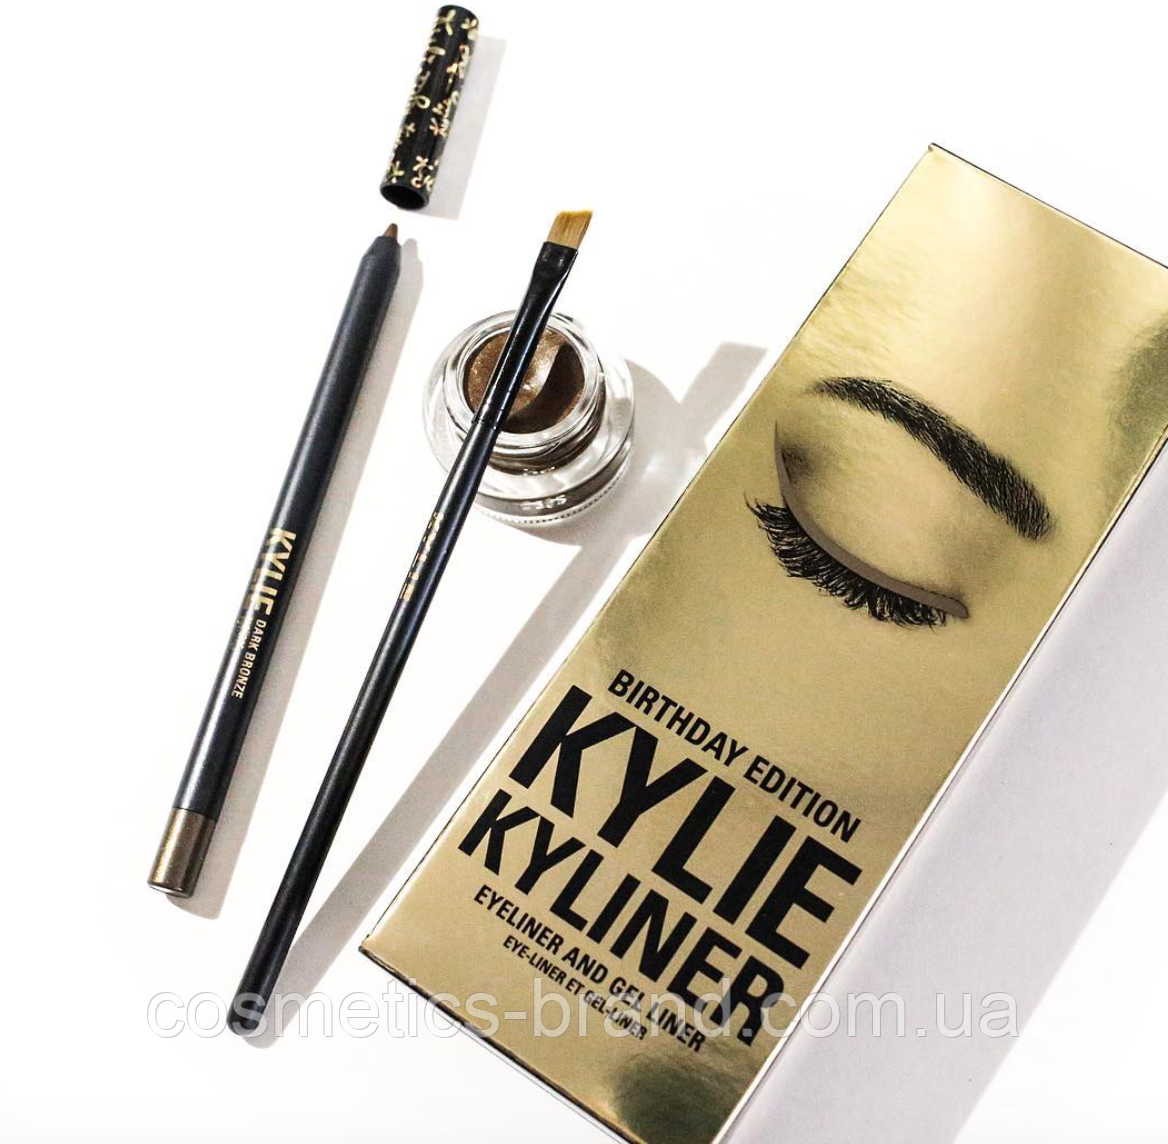 Гелева підводка Kylie Kyliner Dark Bronze (репліка)